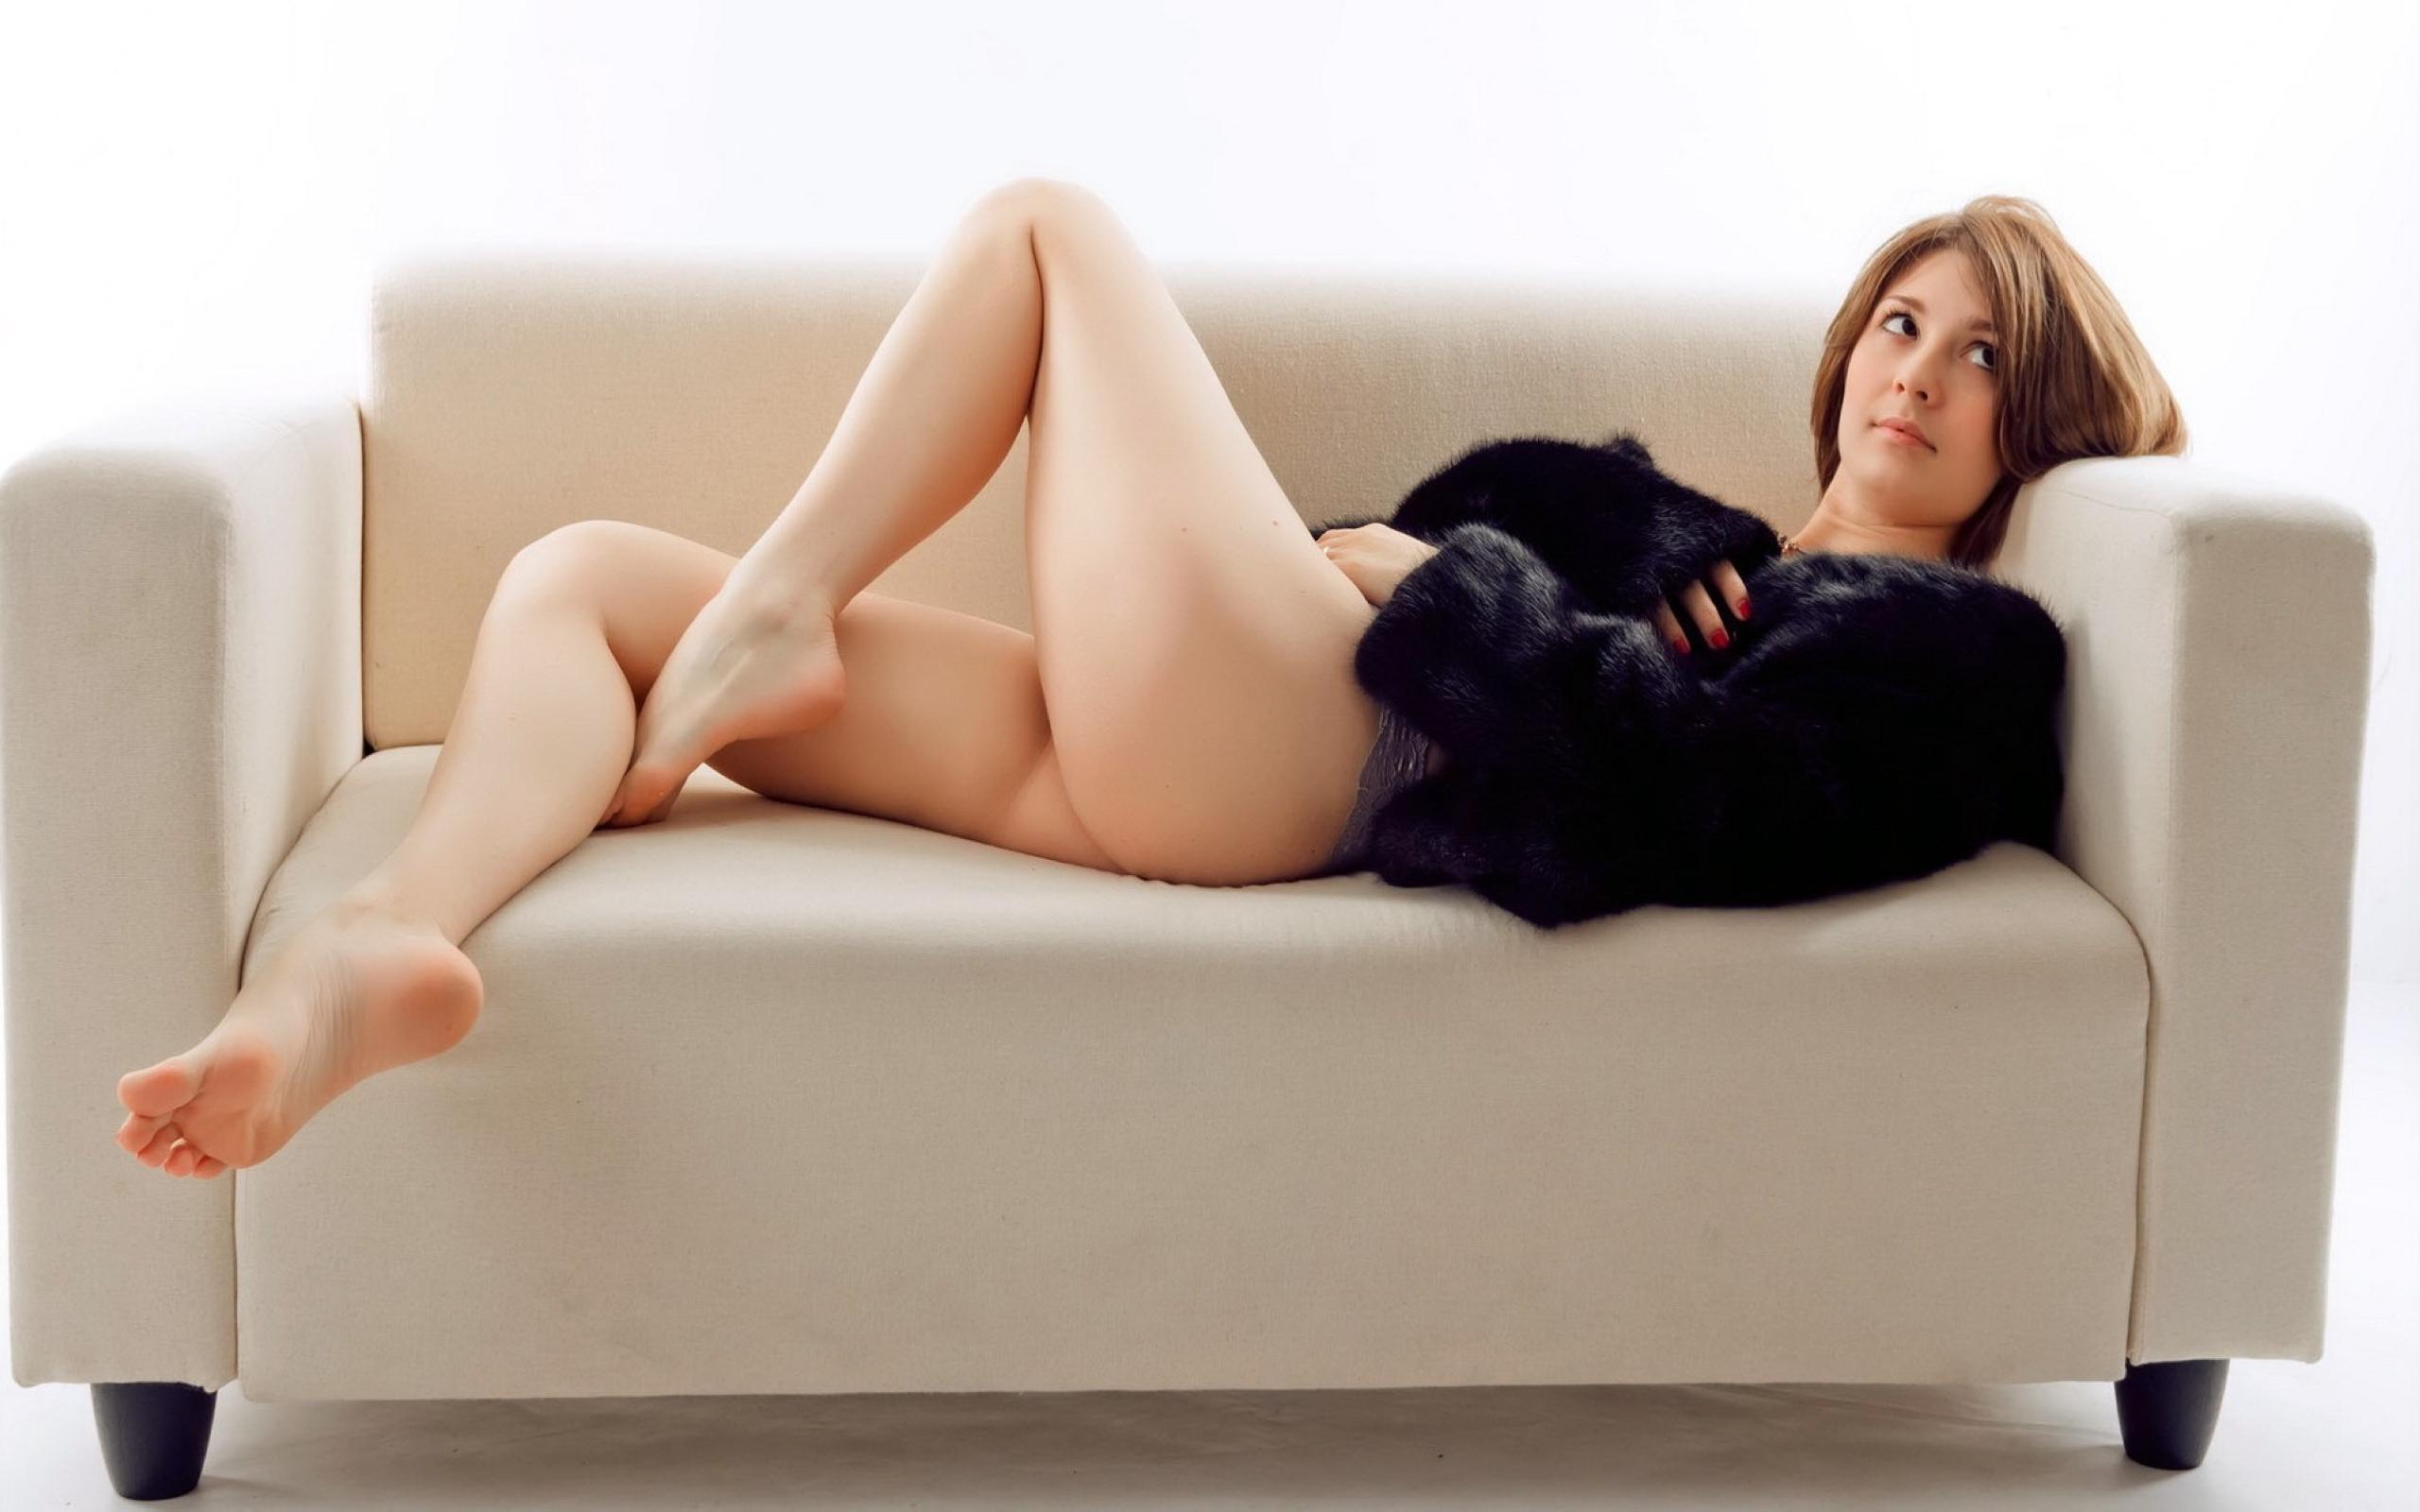 The most beautiful legged porn